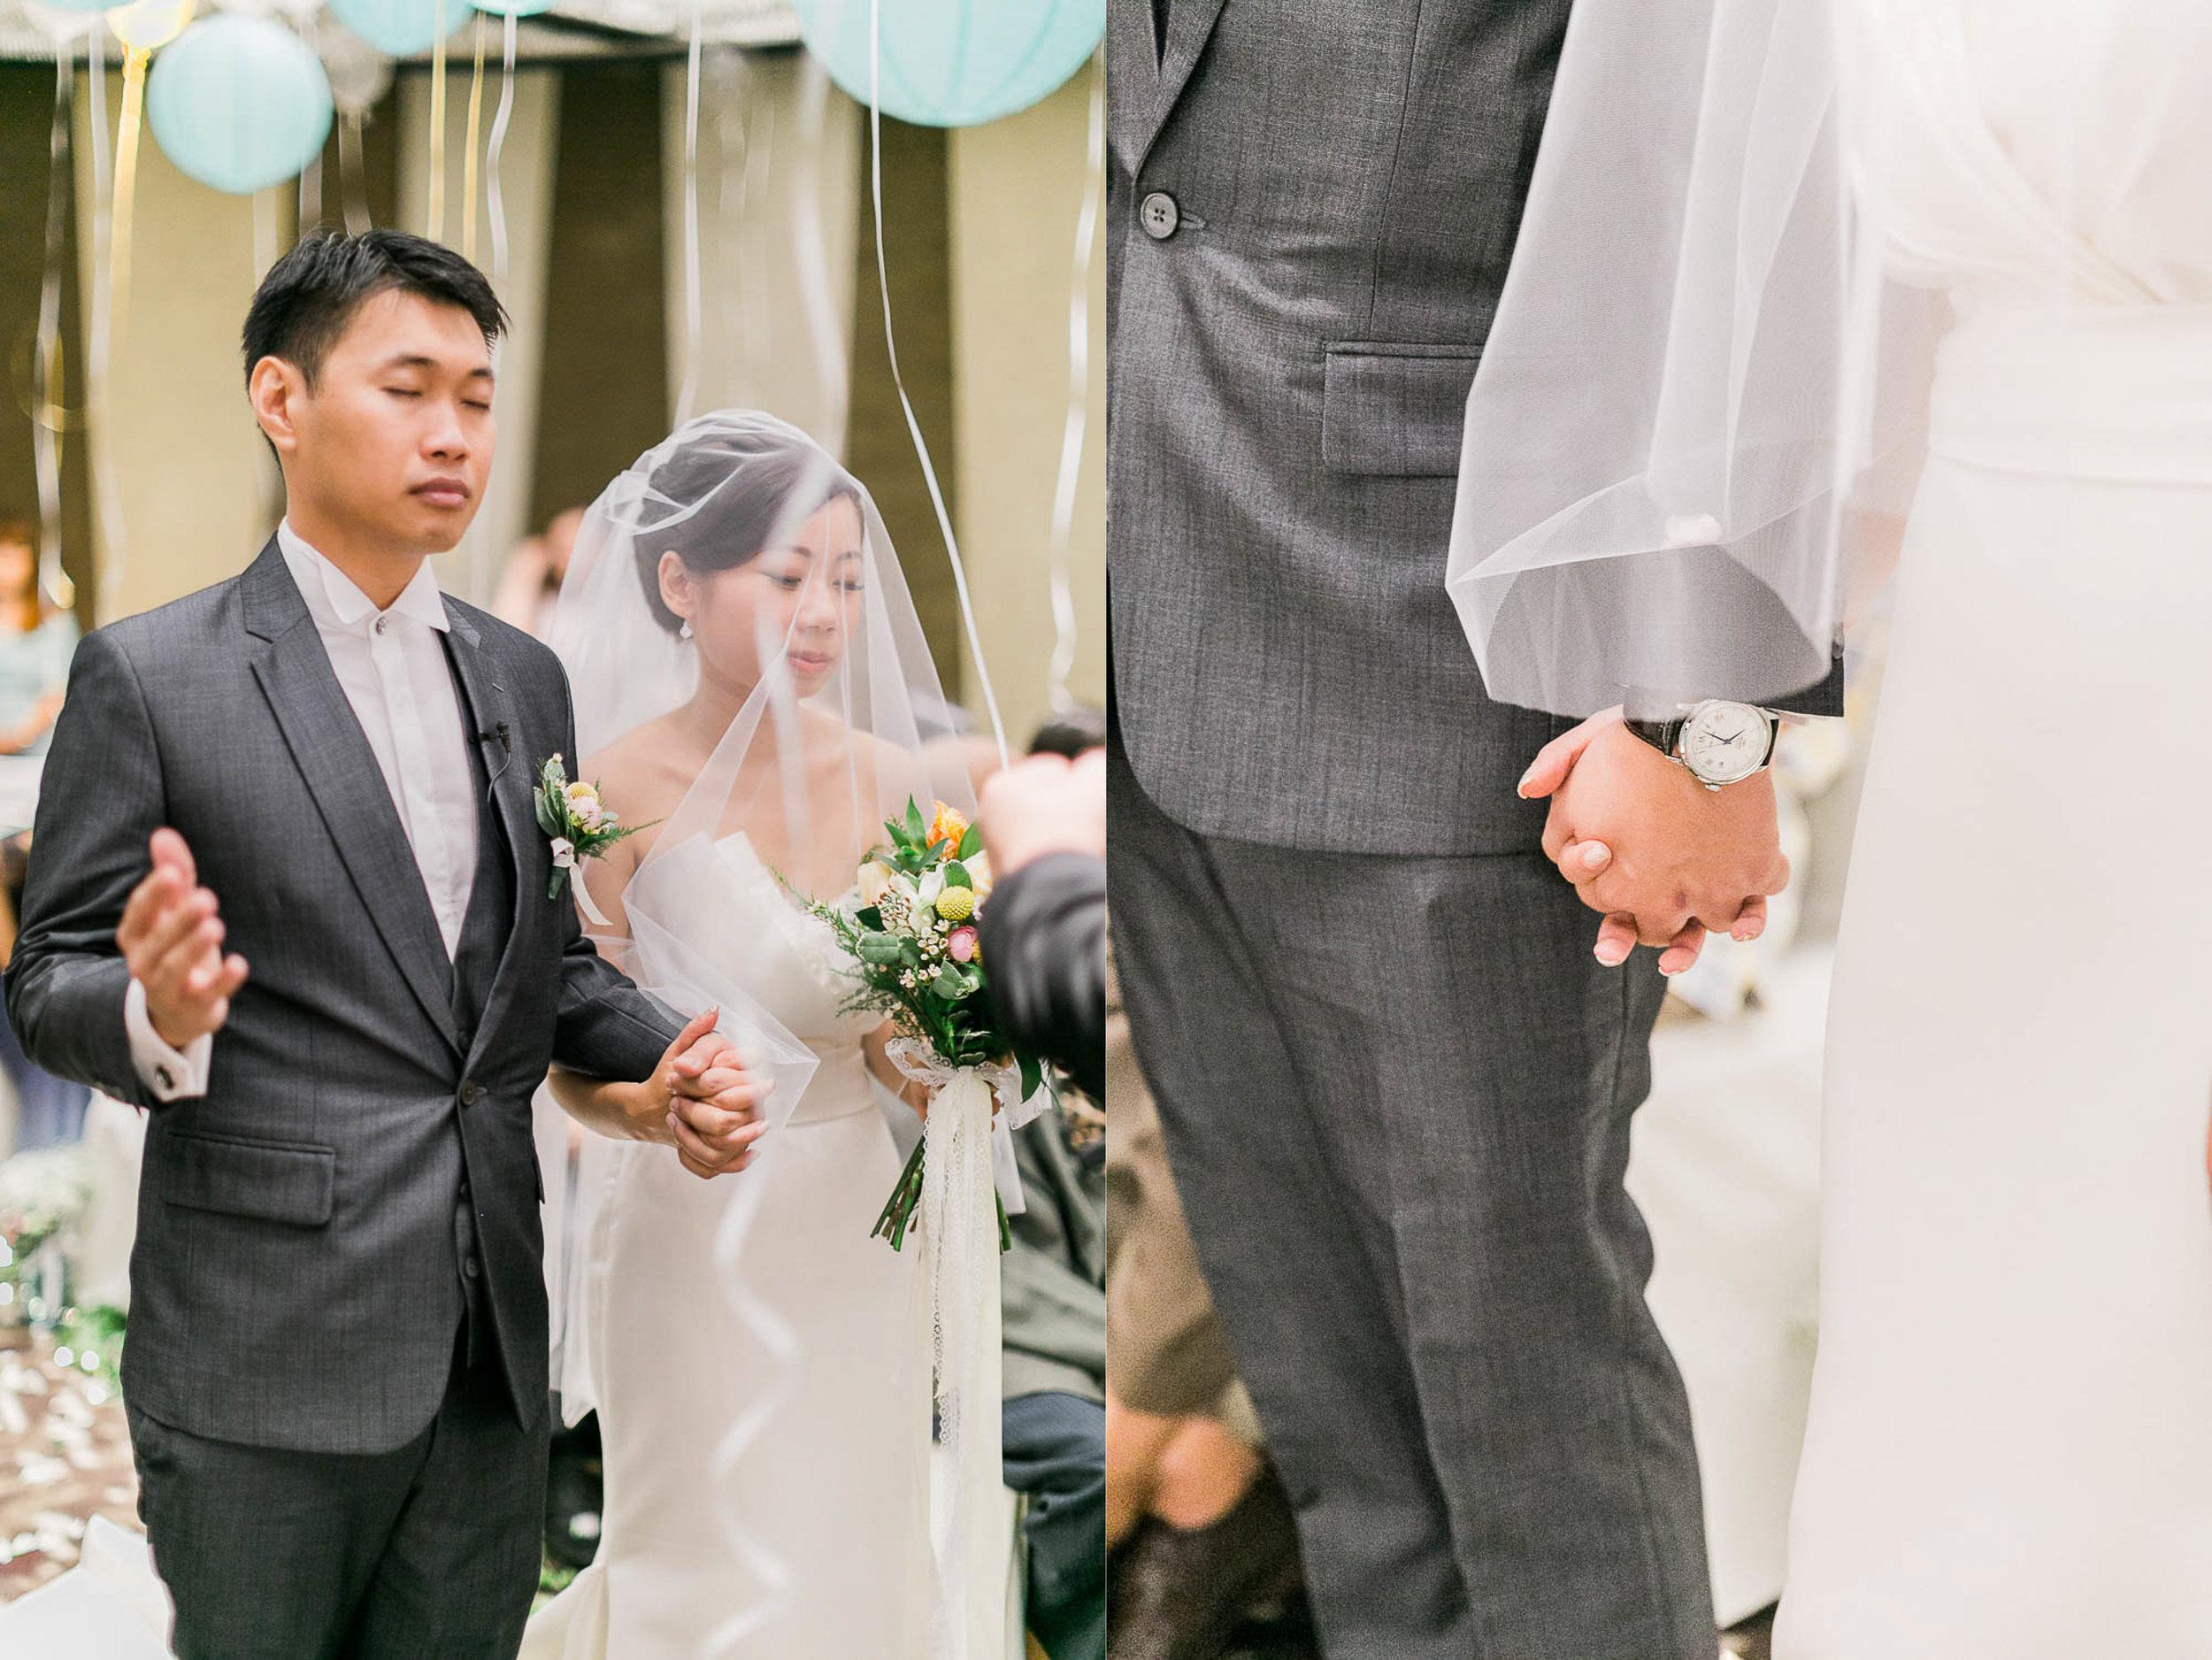 wedding-photographer-singapore-film-photographer-chen-sands-MinKang-wedding-1.jpg